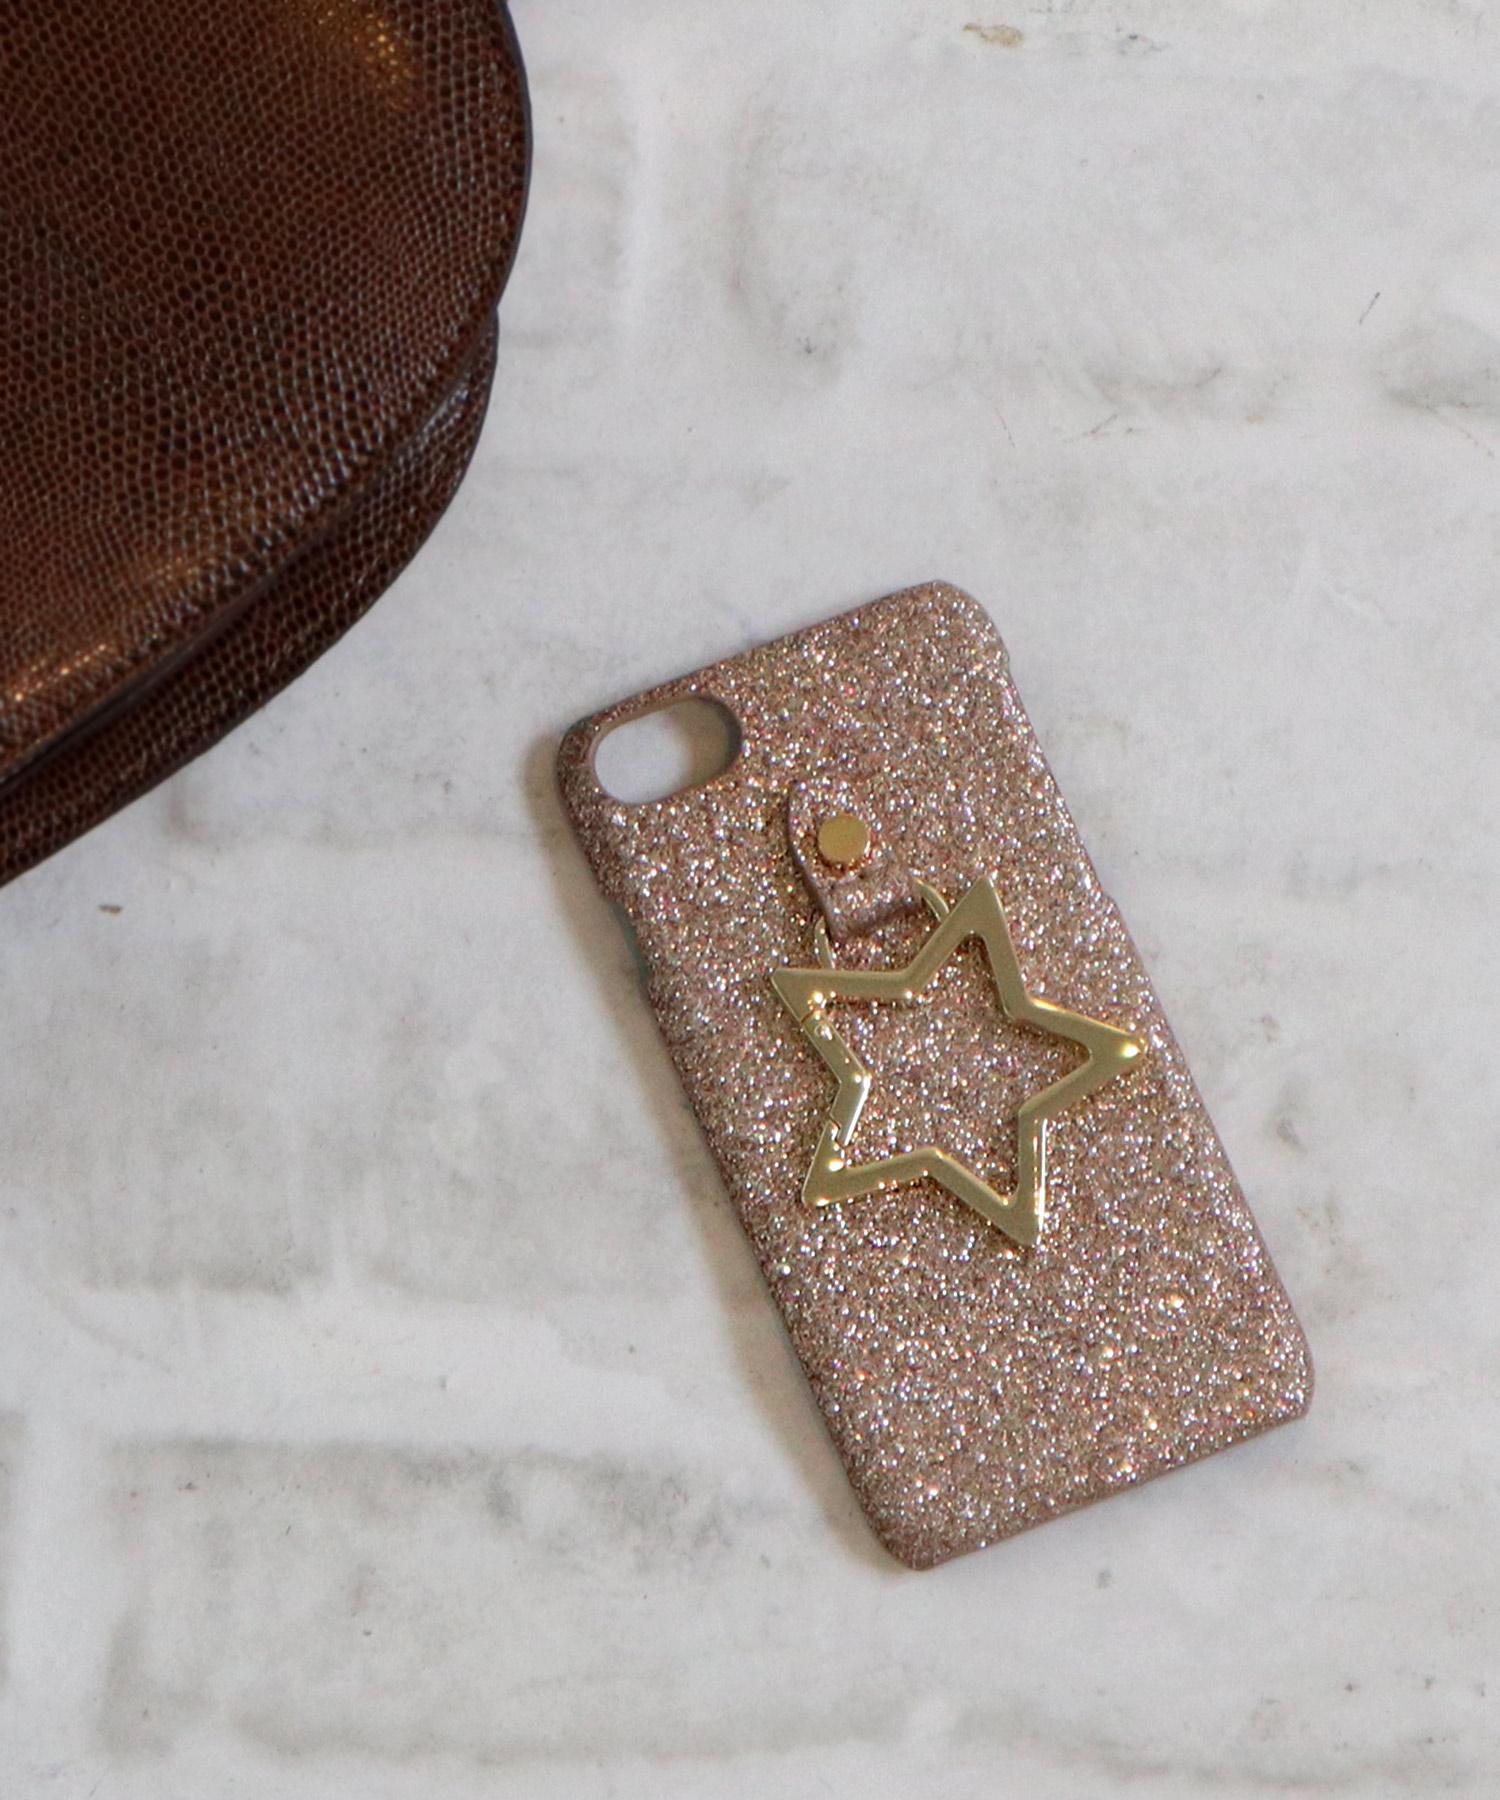 【 Hashibami / ハシバミ 】 # iPhone 8/7/6/6s/SE(第2世代) スマホ 携帯カバーグリッターリング付きケース